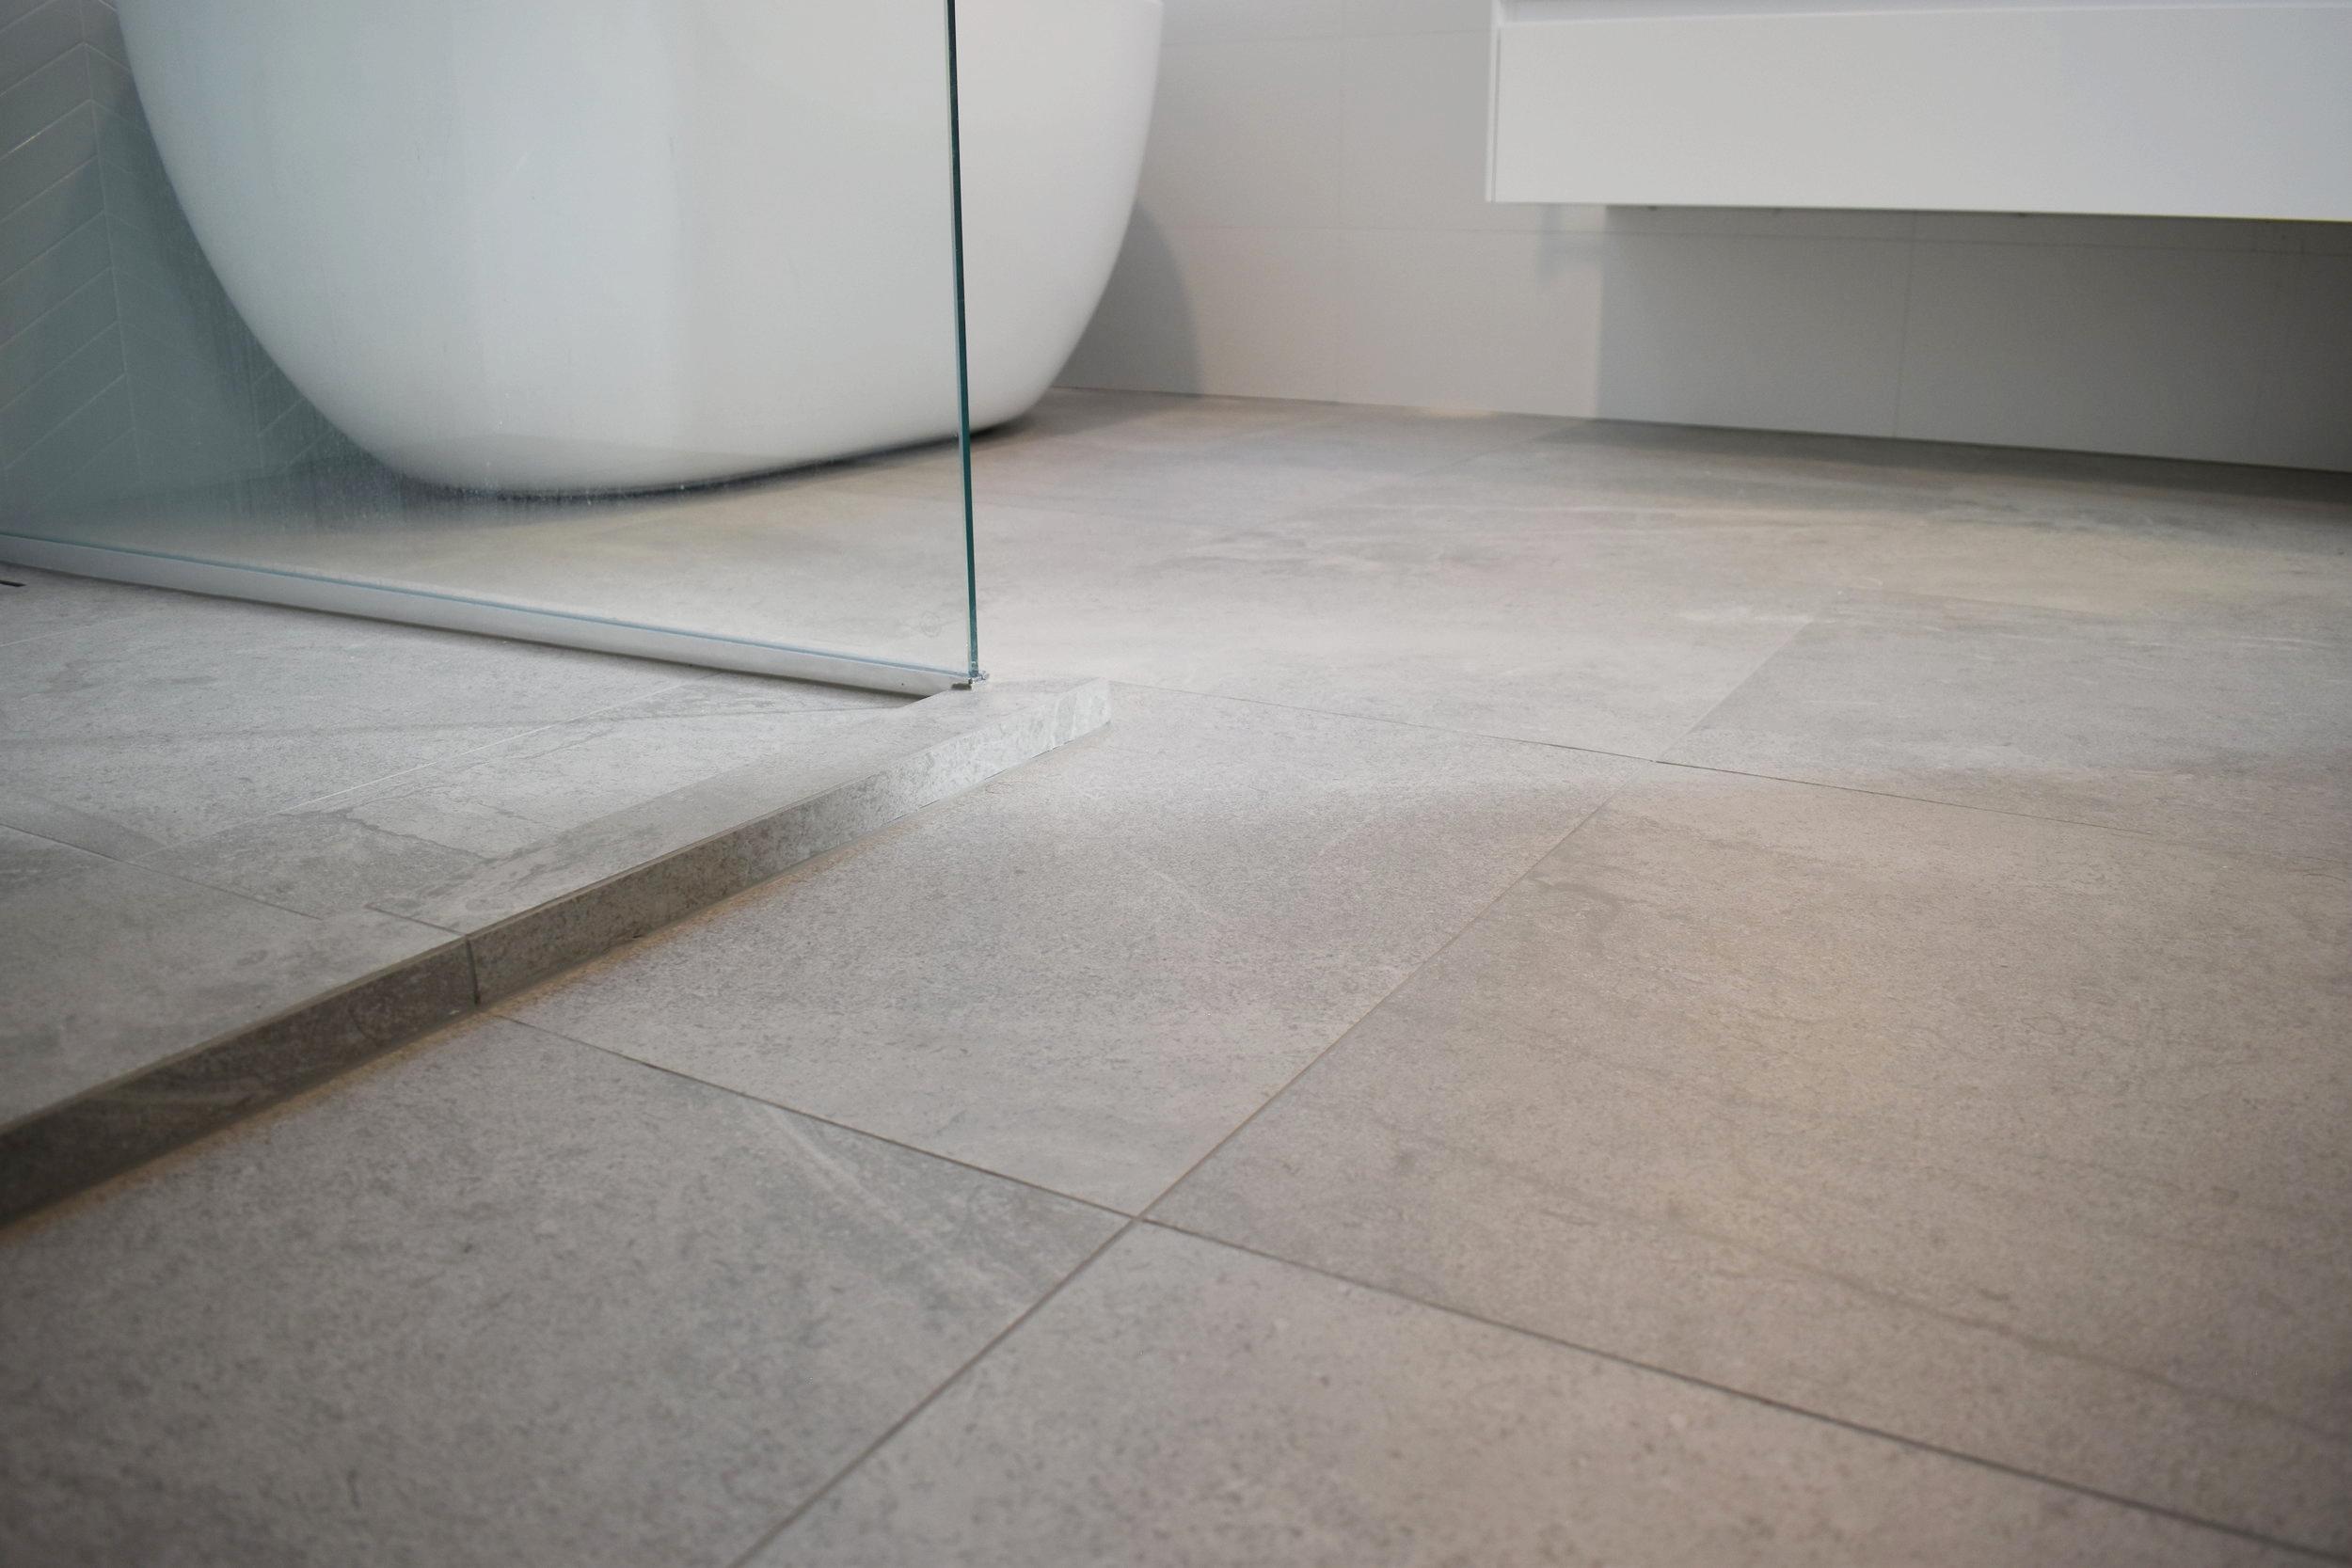 park-rise-bathroom-floor-tile.jpg